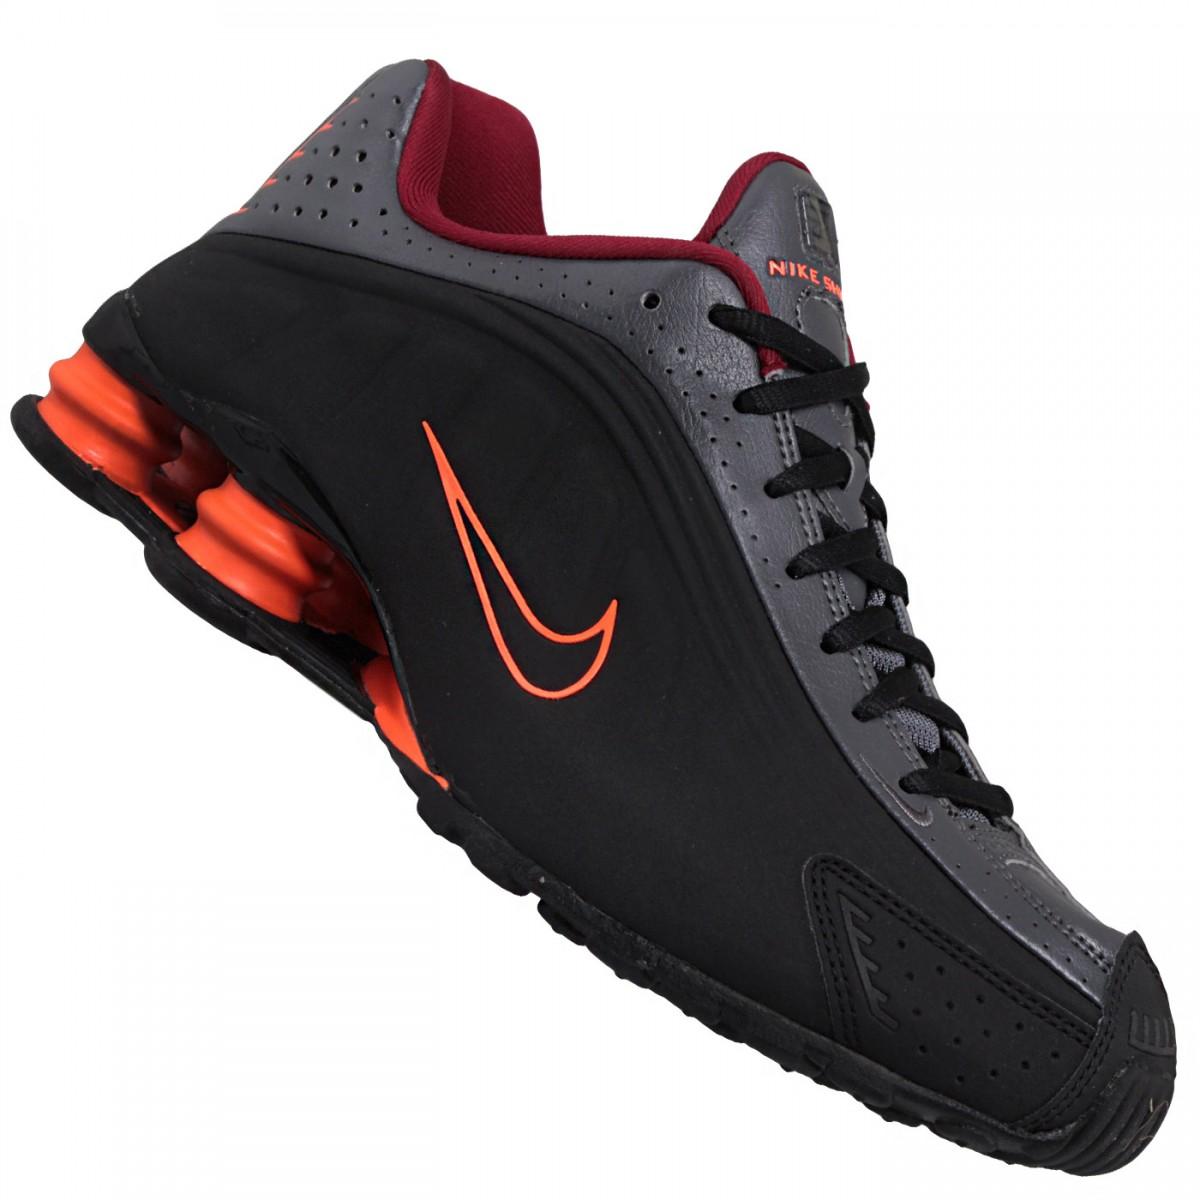 22807b7339f ... buy tênis nike shox r4 masculino 9b92e 44641